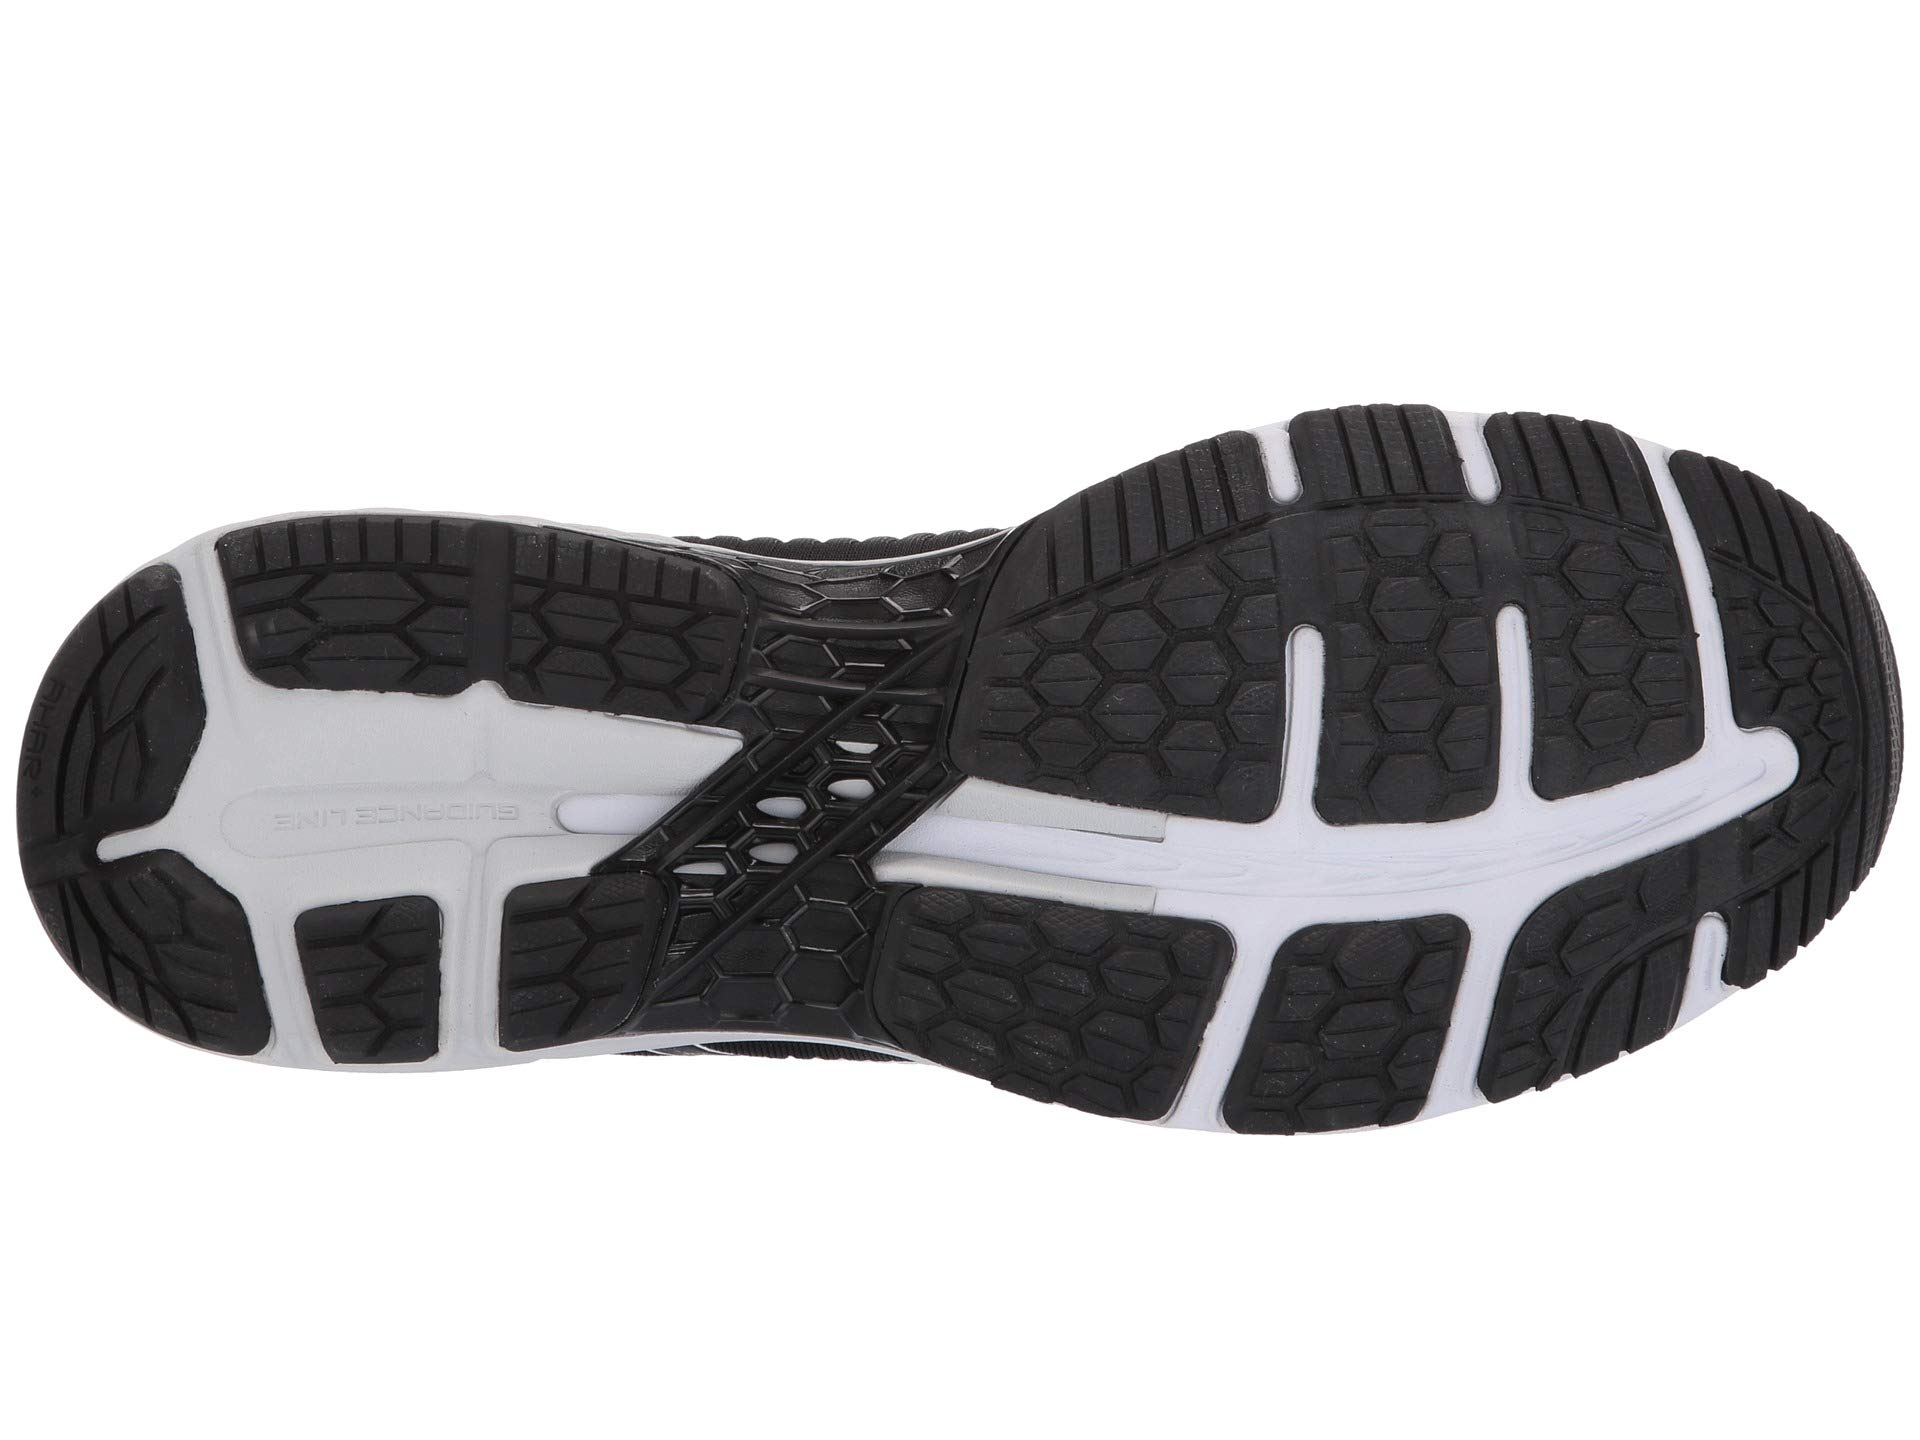 ASICS Gel Kayano 25 Men's Running Shoe, Black/Glacier Grey, 6.5 D US by ASICS (Image #4)